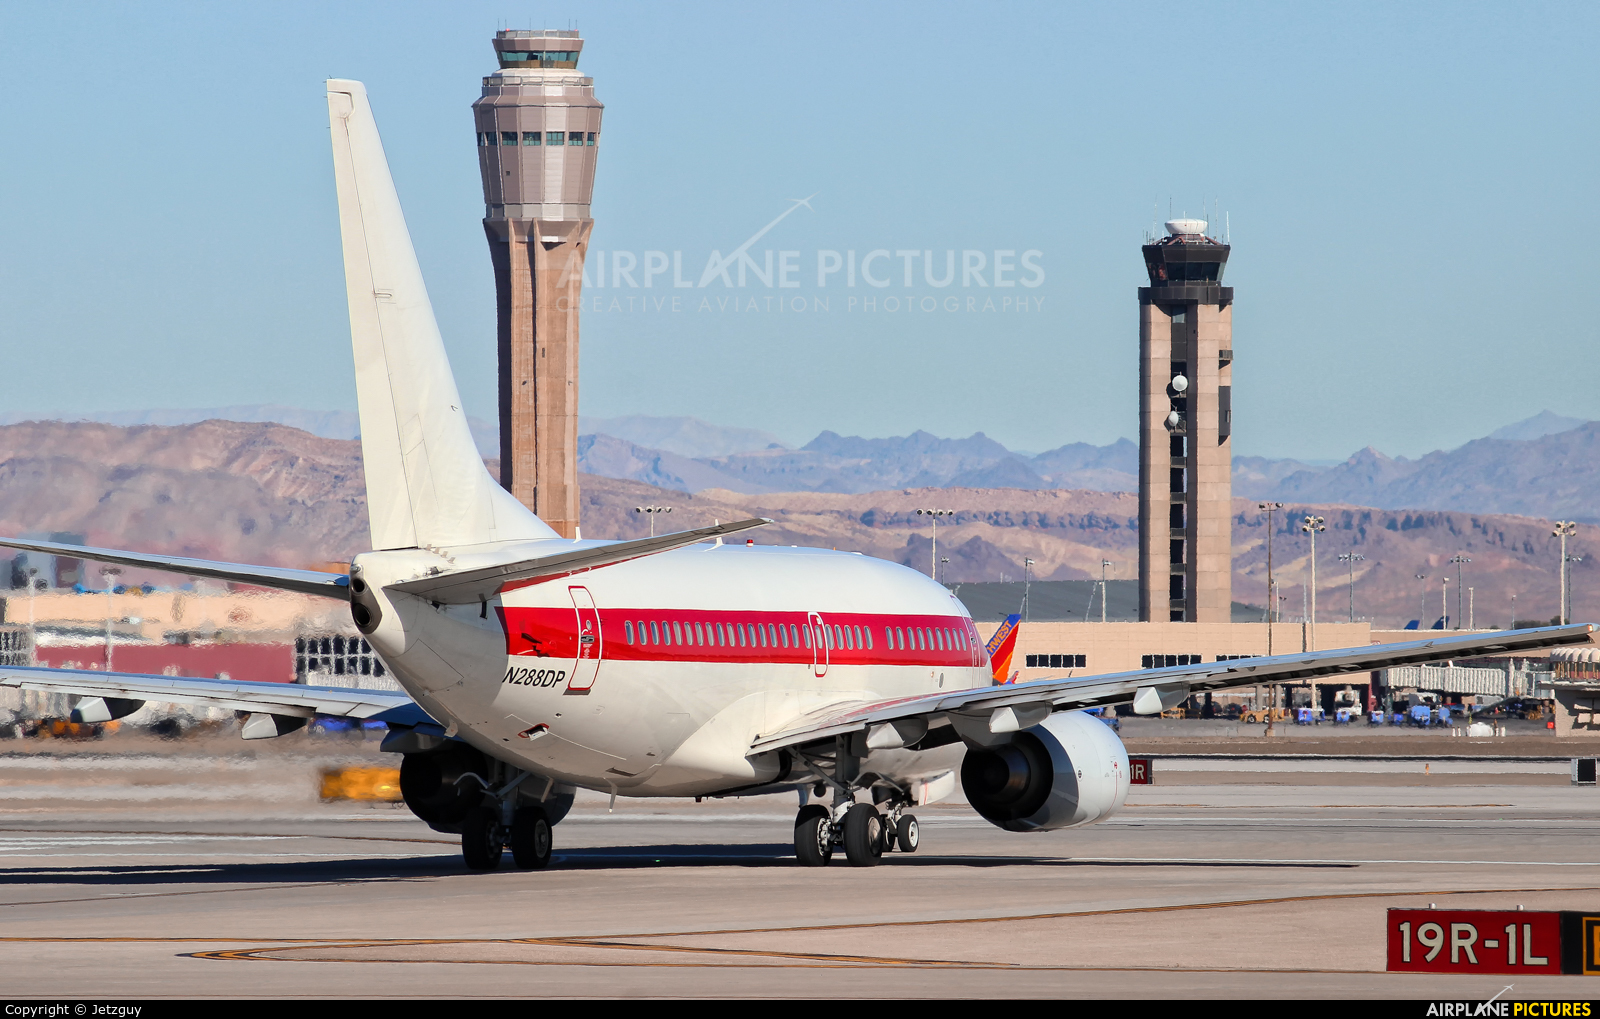 EG&G (Janet Airlines)  N288DP aircraft at Las Vegas - McCarran Intl